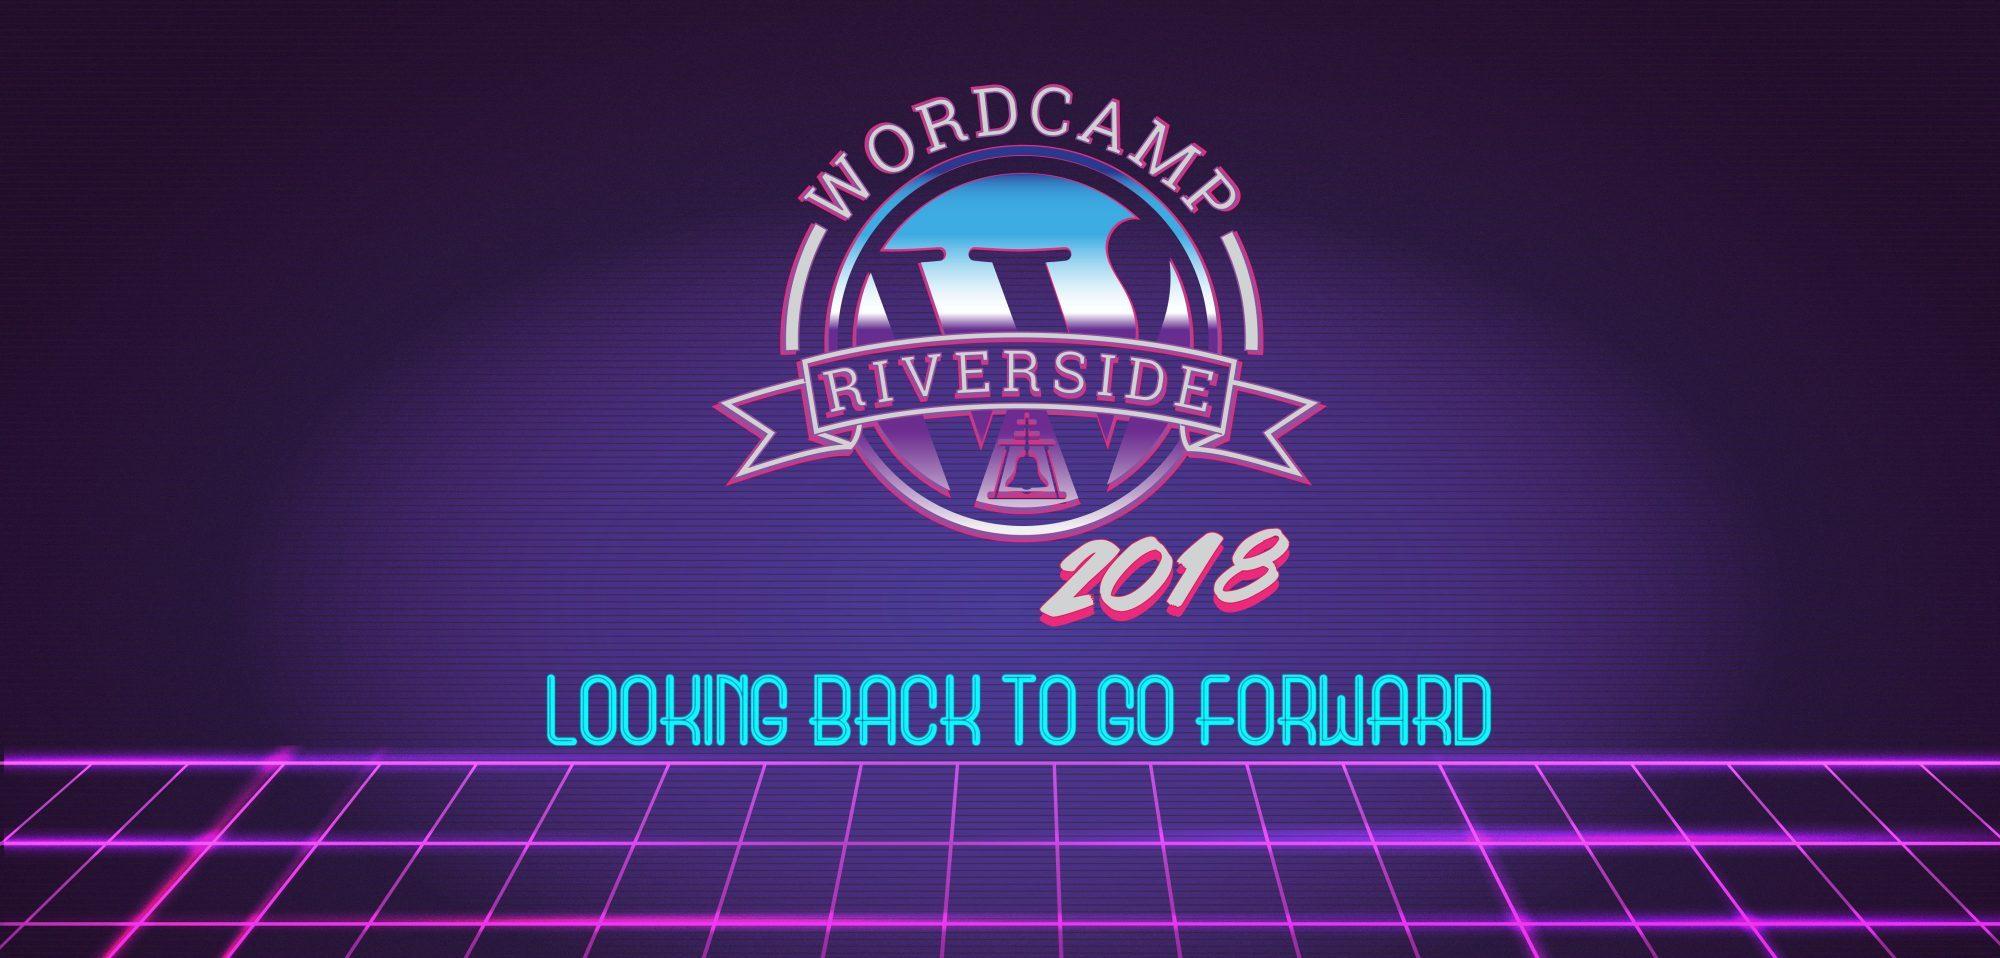 An IndieWeb talk at WordCamp Riverside in November 2018